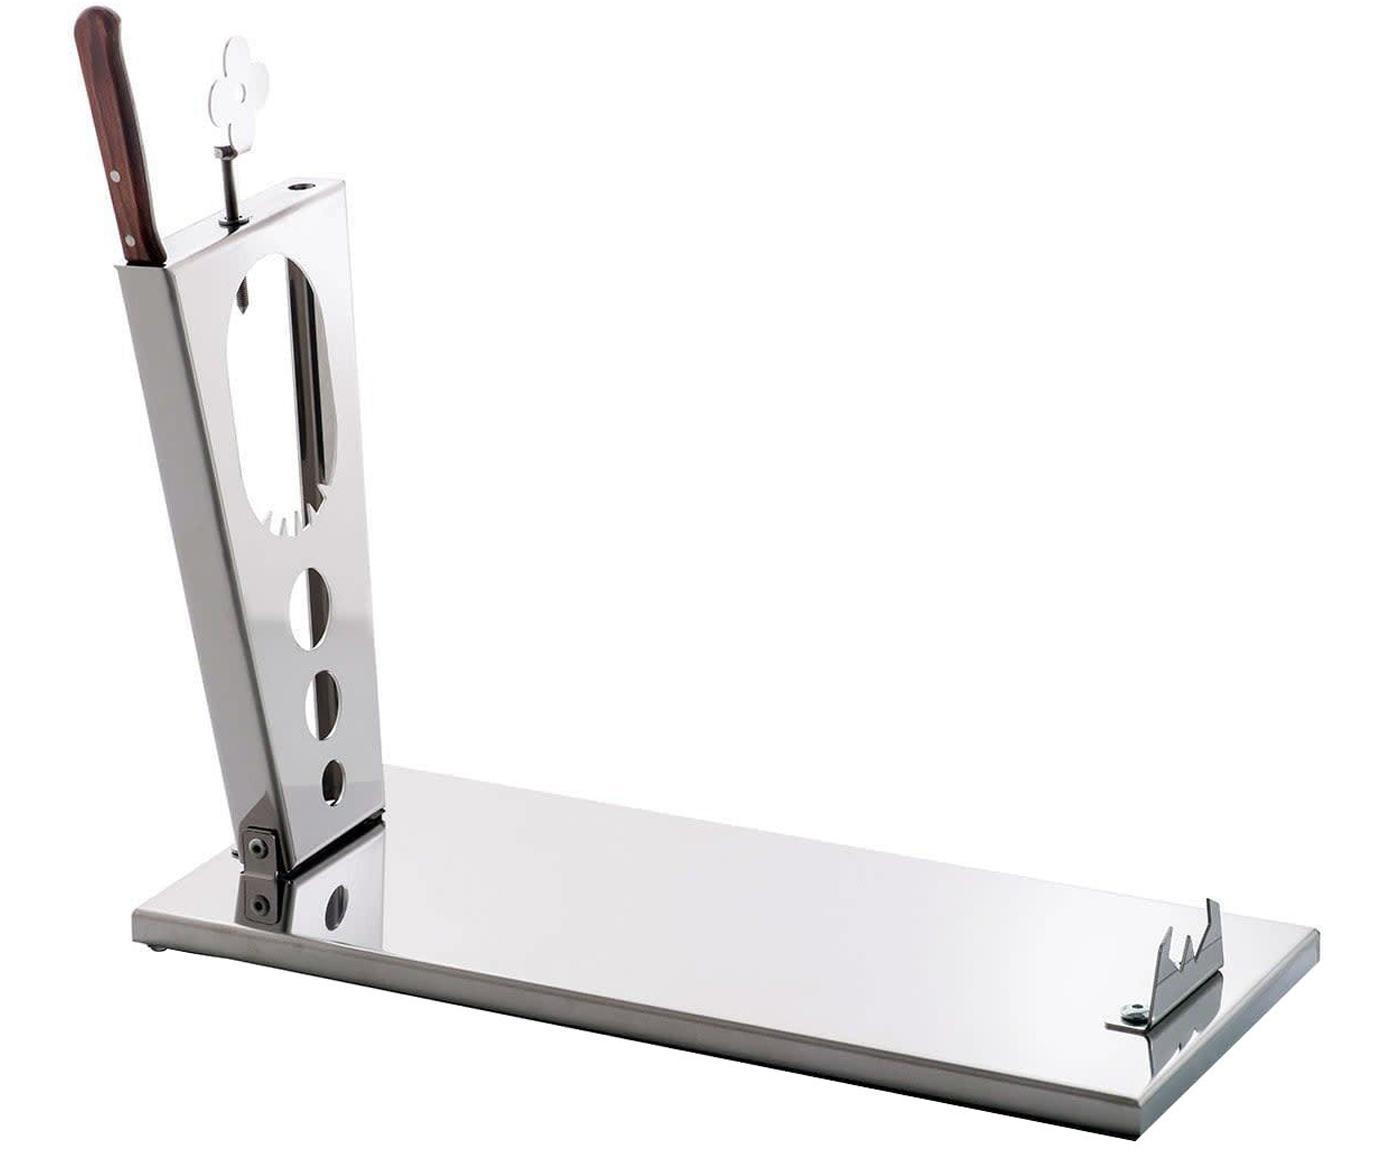 Jamonero Acero, Acero inoxidable, Gris metalizado, An 45 x H 37 cm